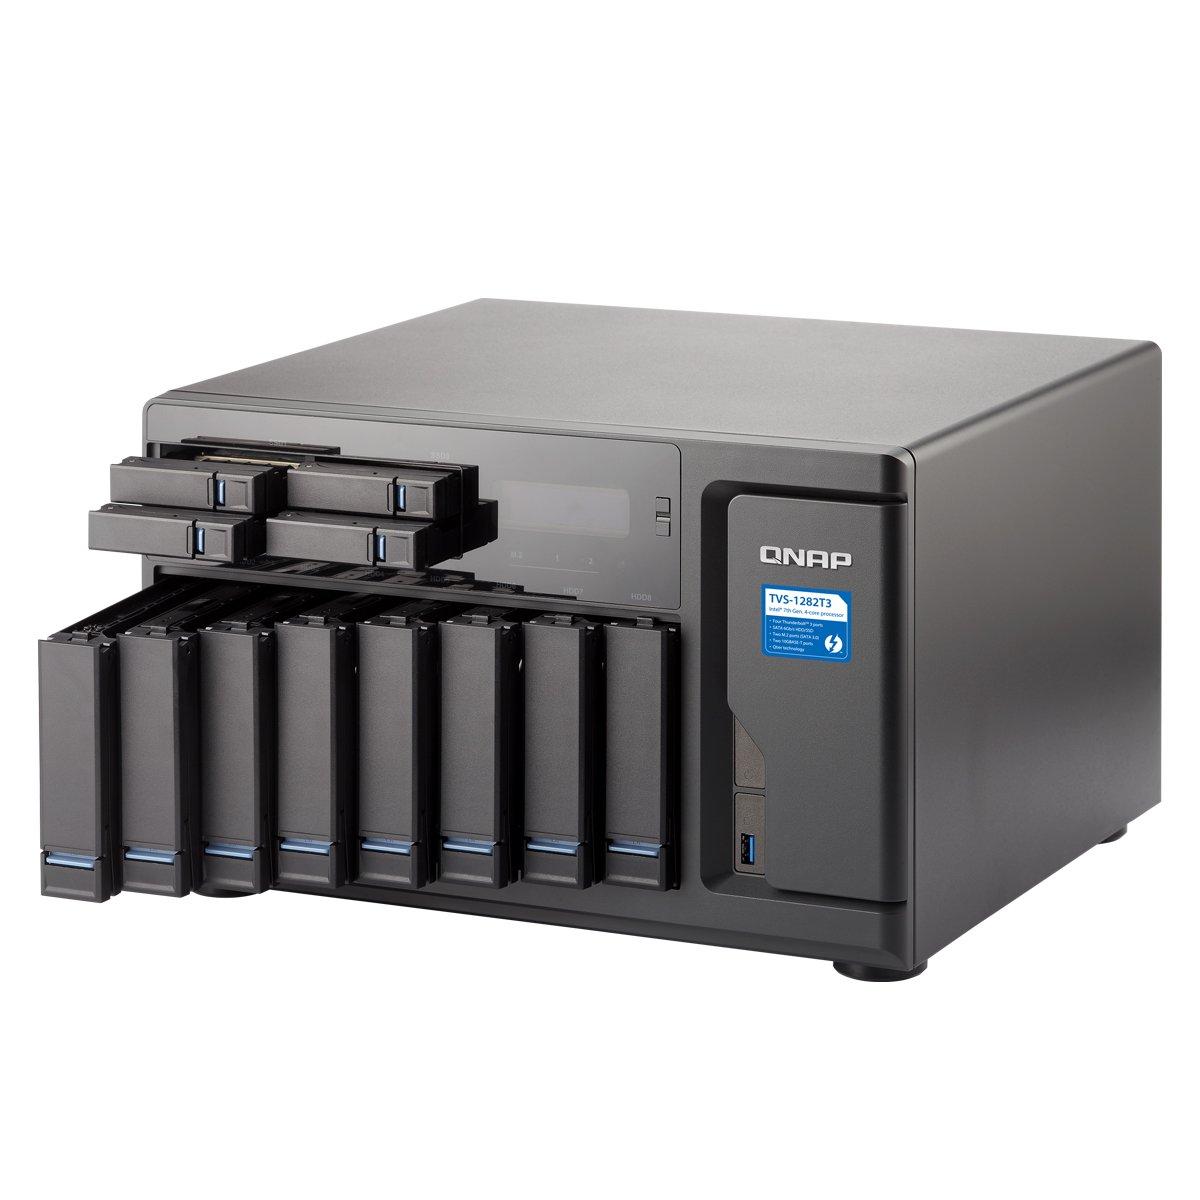 Qnap TVS-1282T3-i7-64G-US Ultra-High Speed 12 bay (8+4) Thunderbolt 3 NAS/iSCSI IP-SAN, Intel 7th Gen Kaby Lake Core i7 3.6GHz Quad Core, 64GB RAM, Thunderbolt3 port x 4 and 10Gbase-T x 2 by QNAP (Image #2)